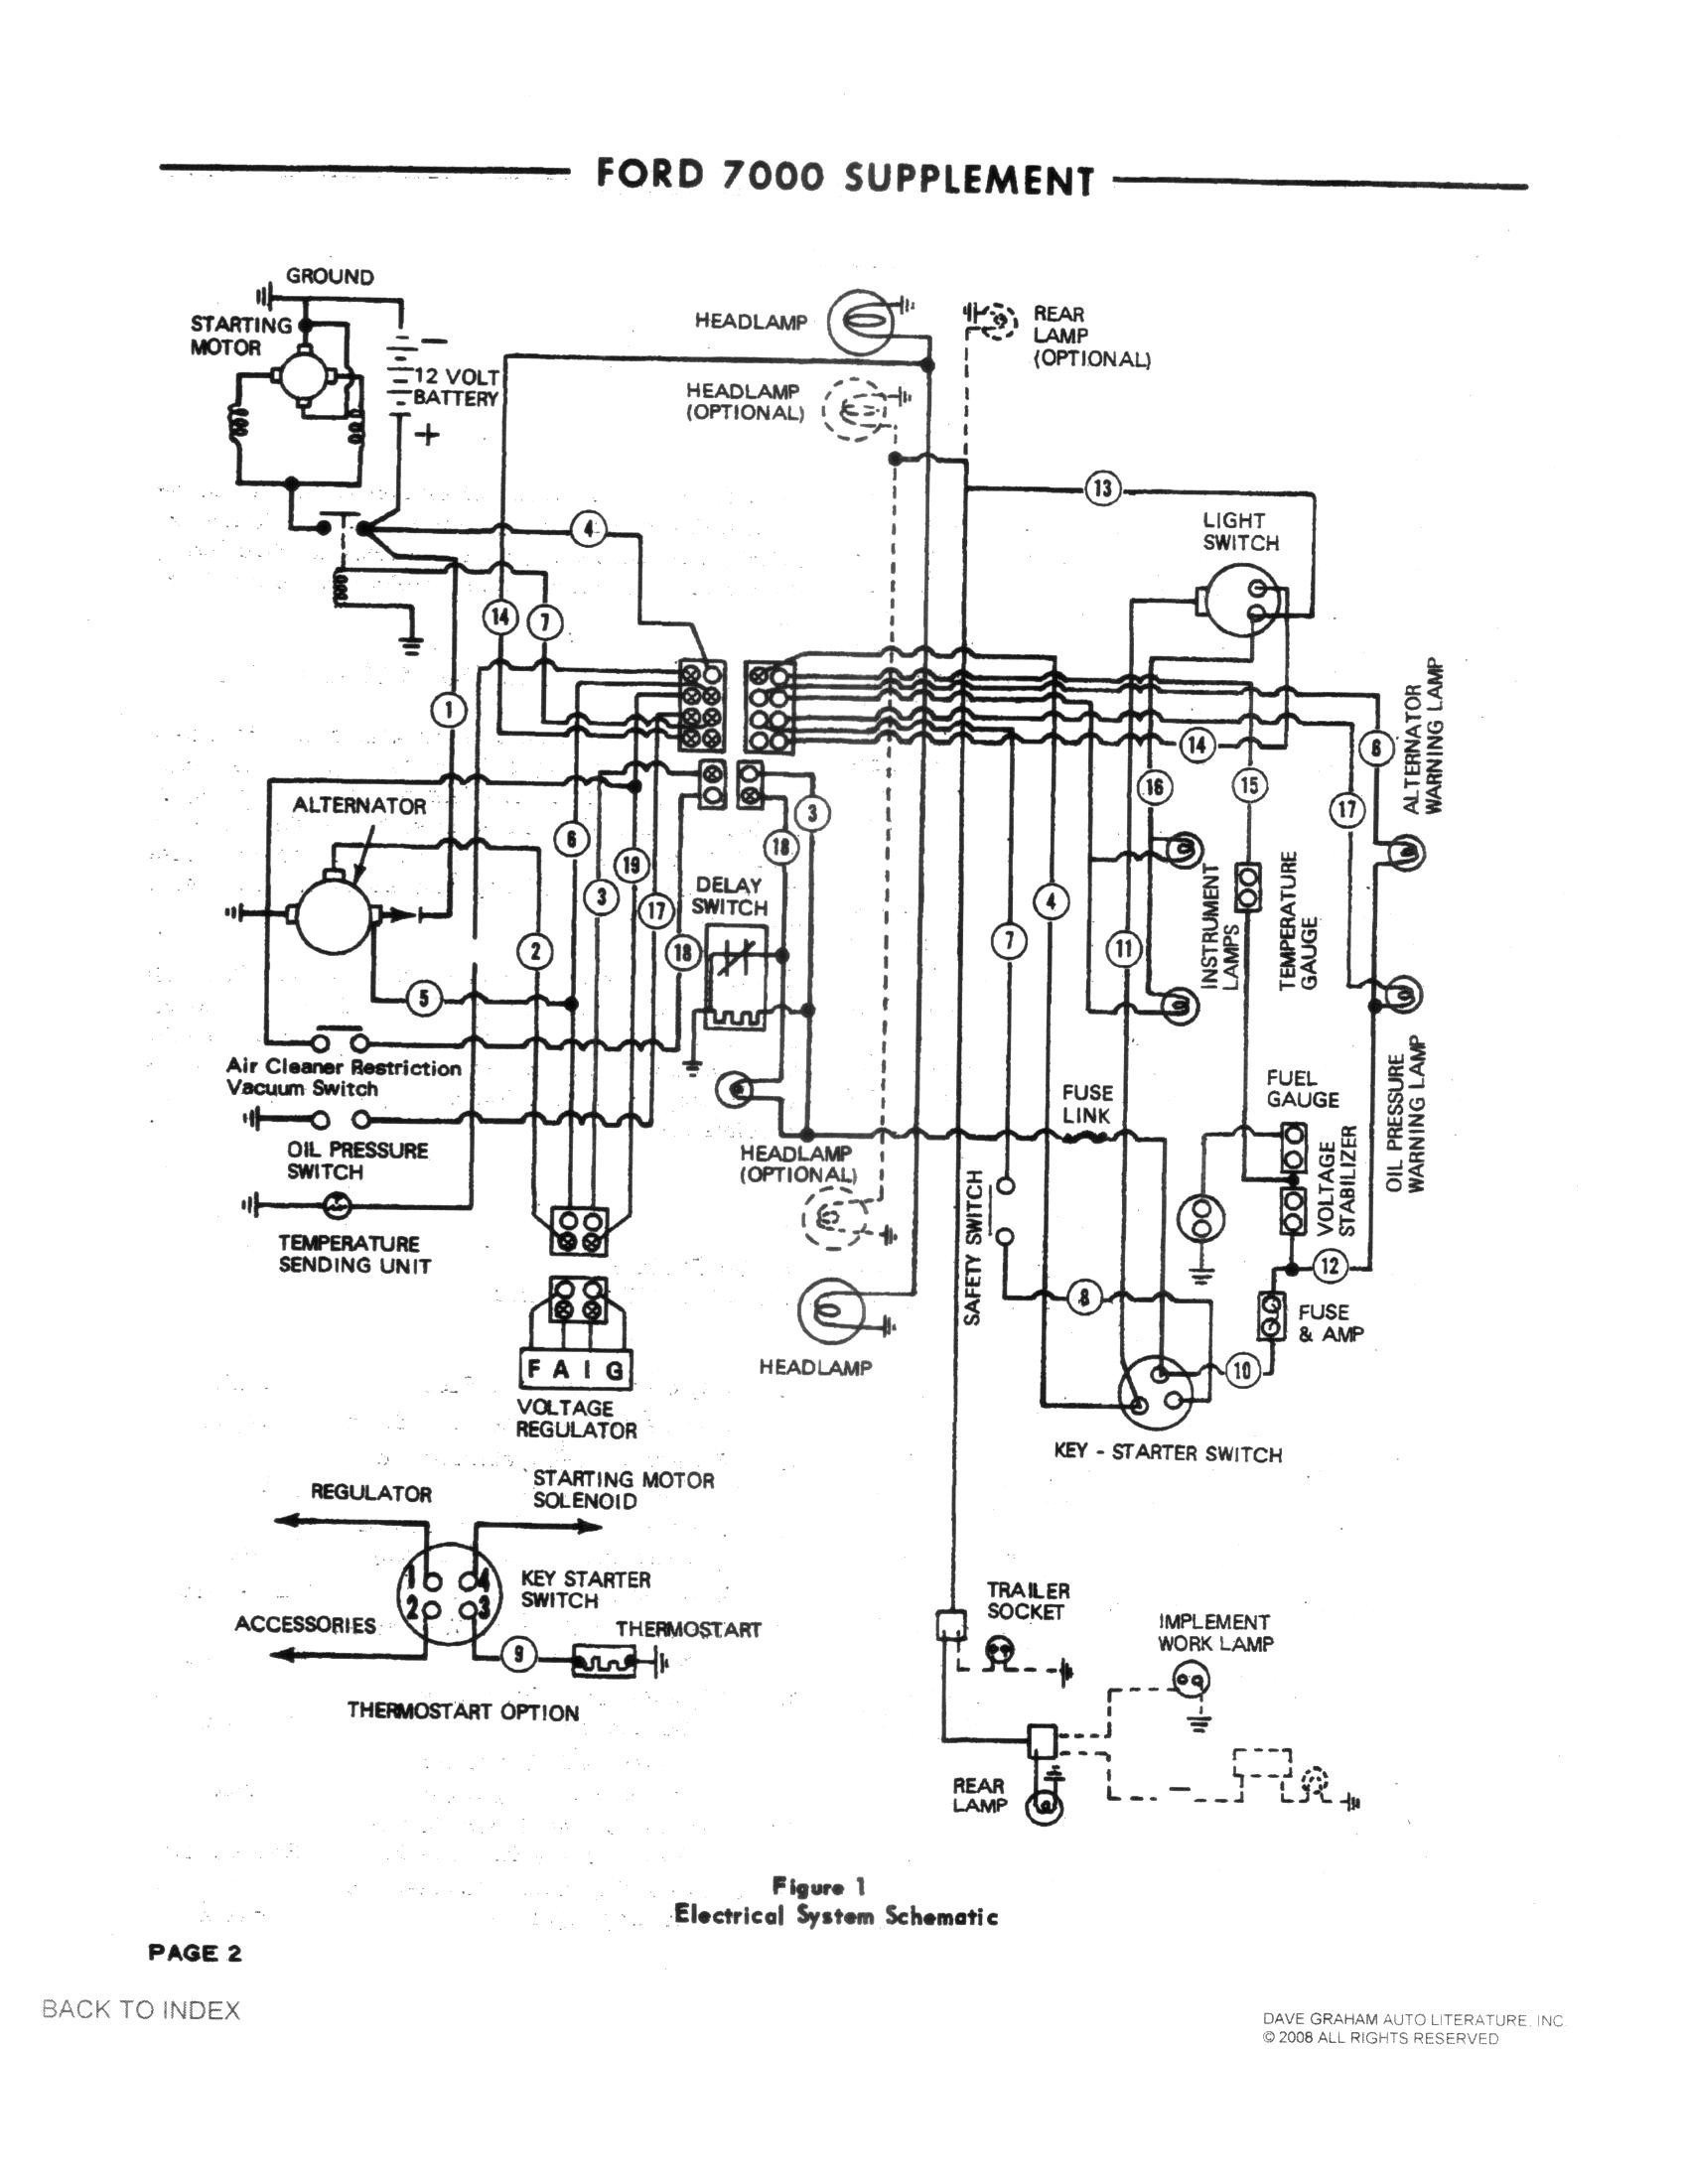 Wiring Diagram Alternator Voltage Regulator Best Lucas Voltage Regulator Wiring Diagram Dolgular Fresh Kubota Tractor Alternator Wiring Diagrams Dolgular